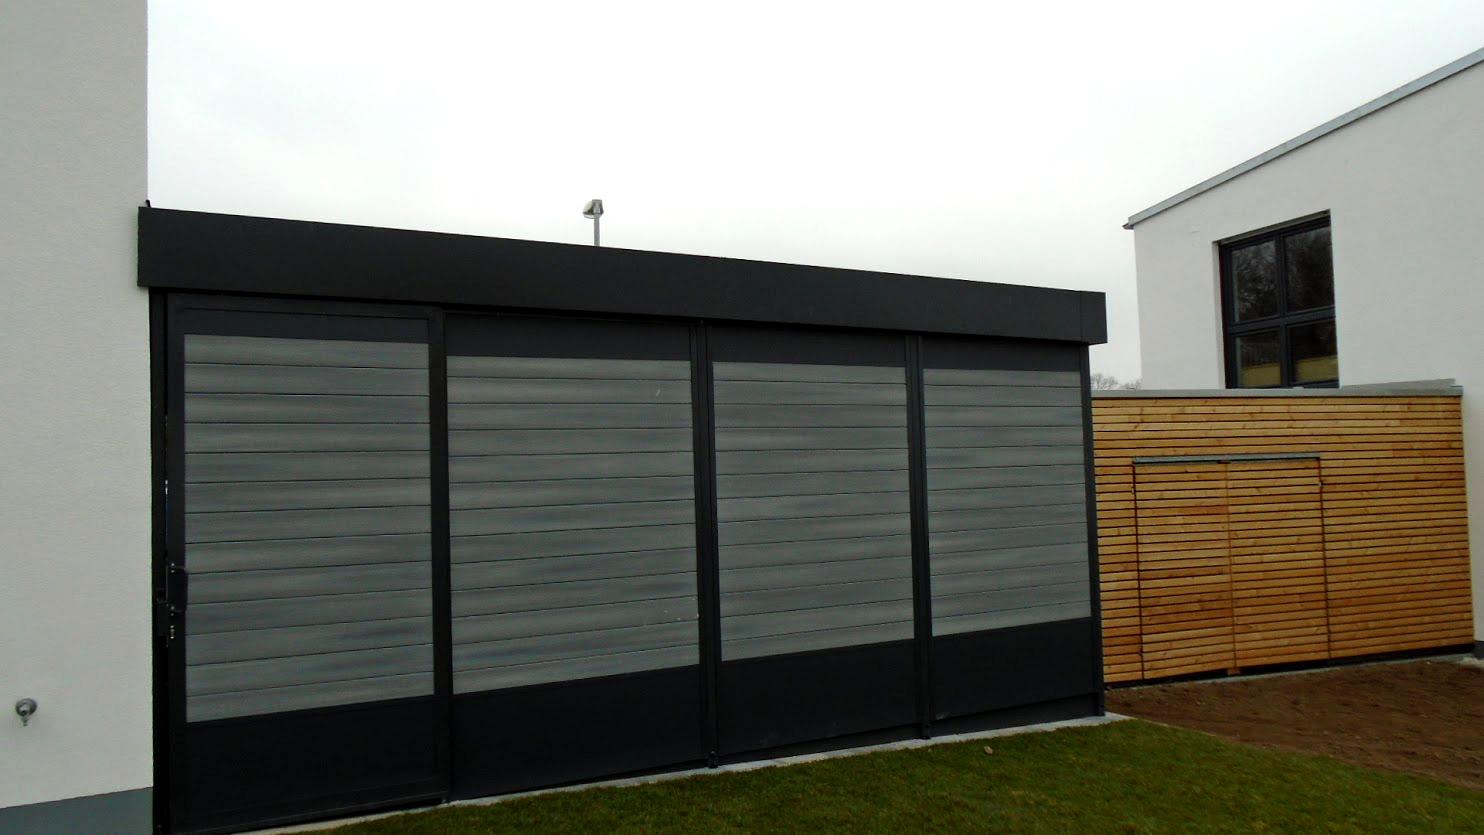 Carport mit Eingangsüberdachung - Carportmaster Projekt 15-P-1016 - 90587 Veitsbronn - Carportbild 02